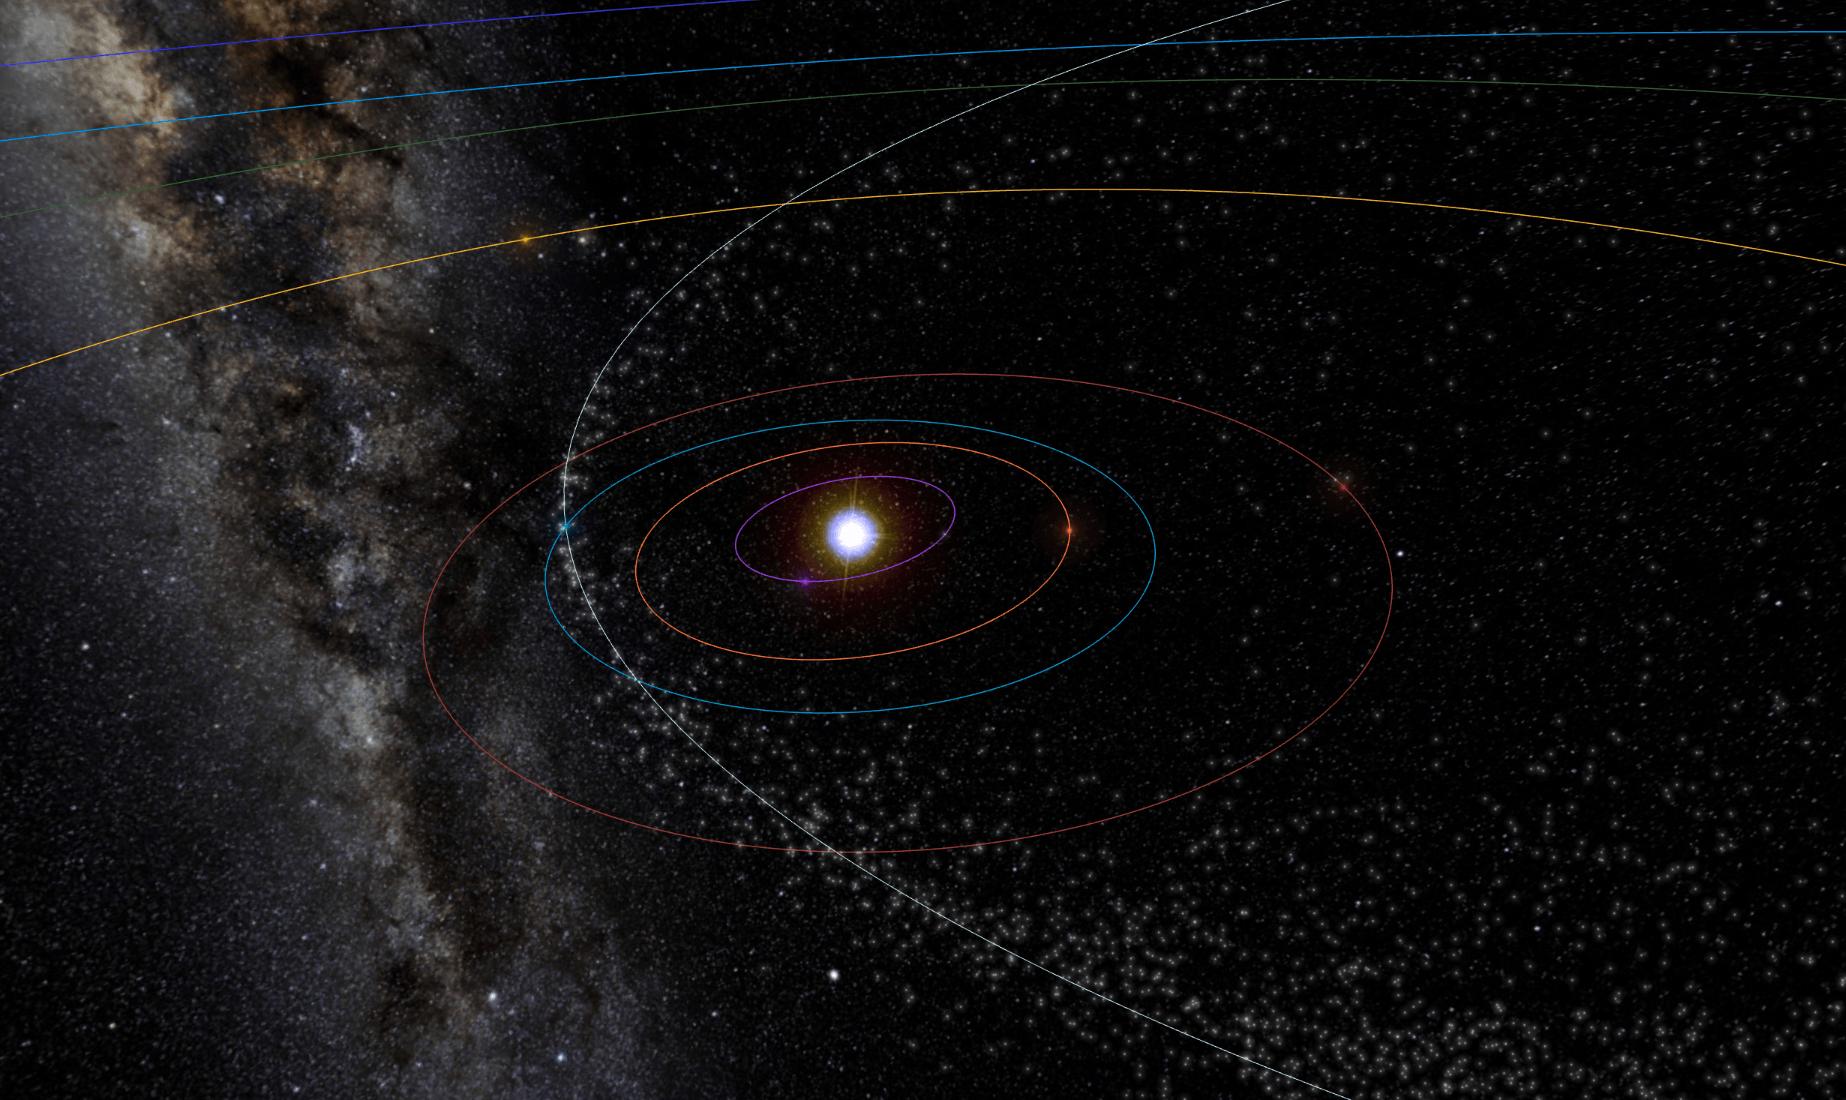 étoiles Filantes Comment Observer Les Célèbres Perséïdes